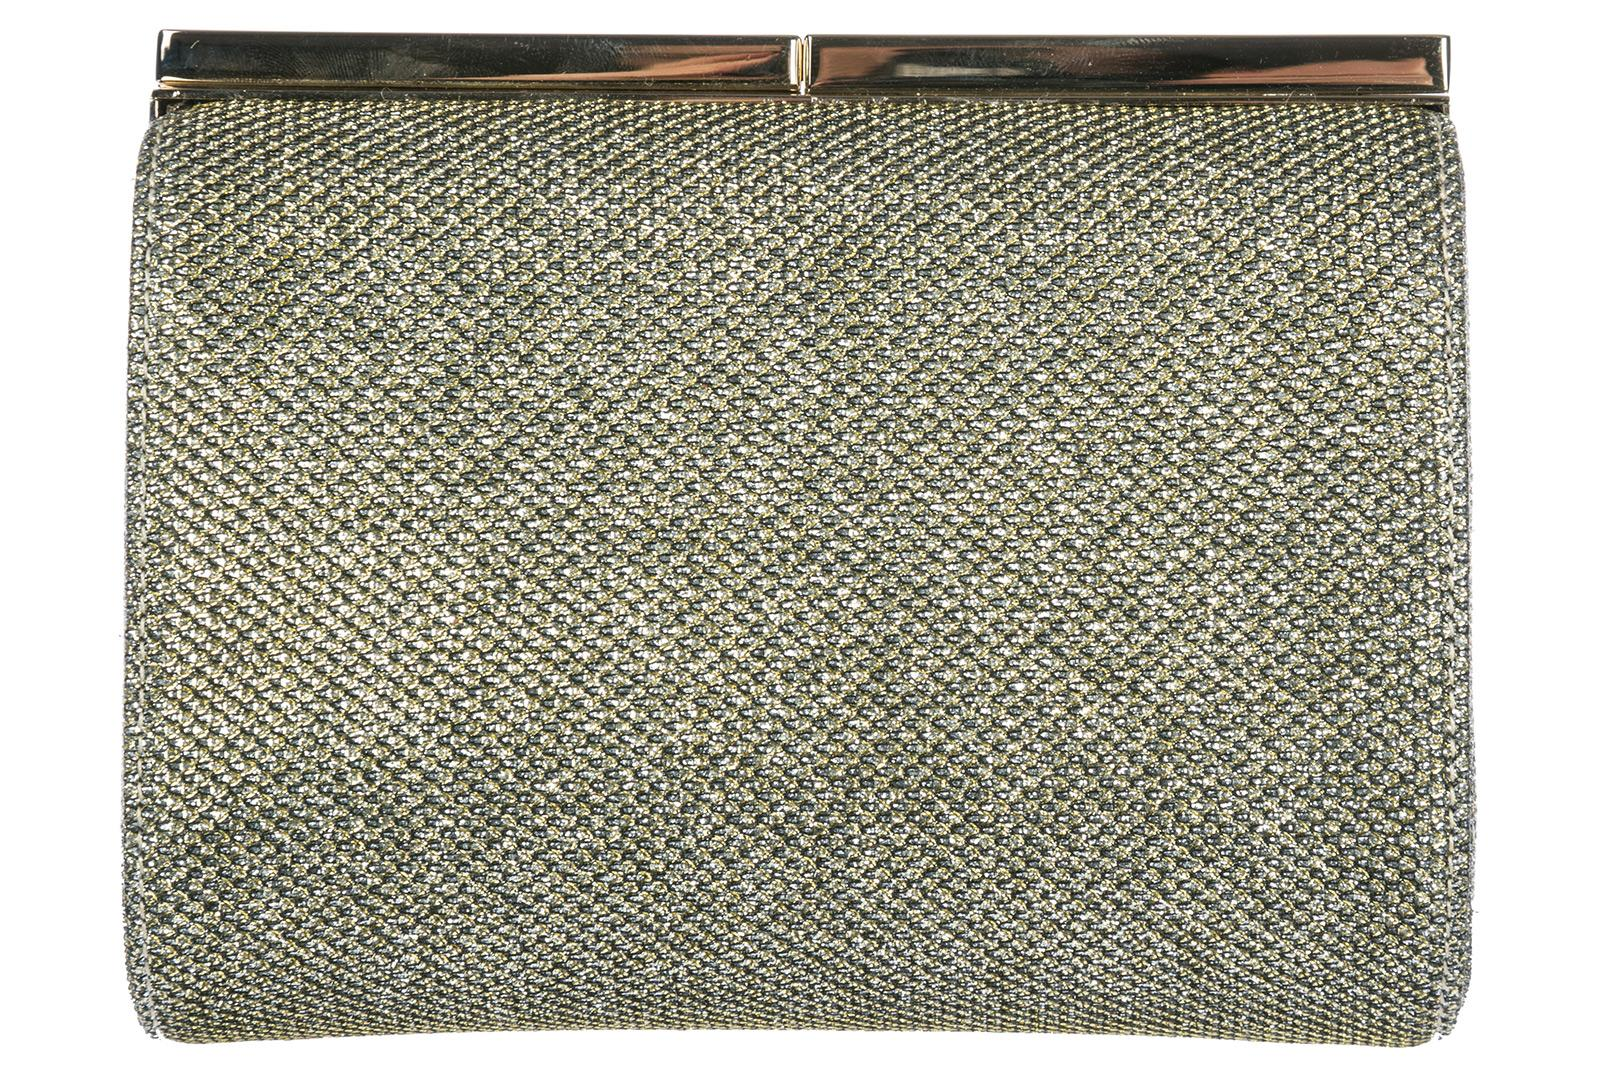 Jimmy Choo Women's Clutch Handbag Bag Purse In Gold